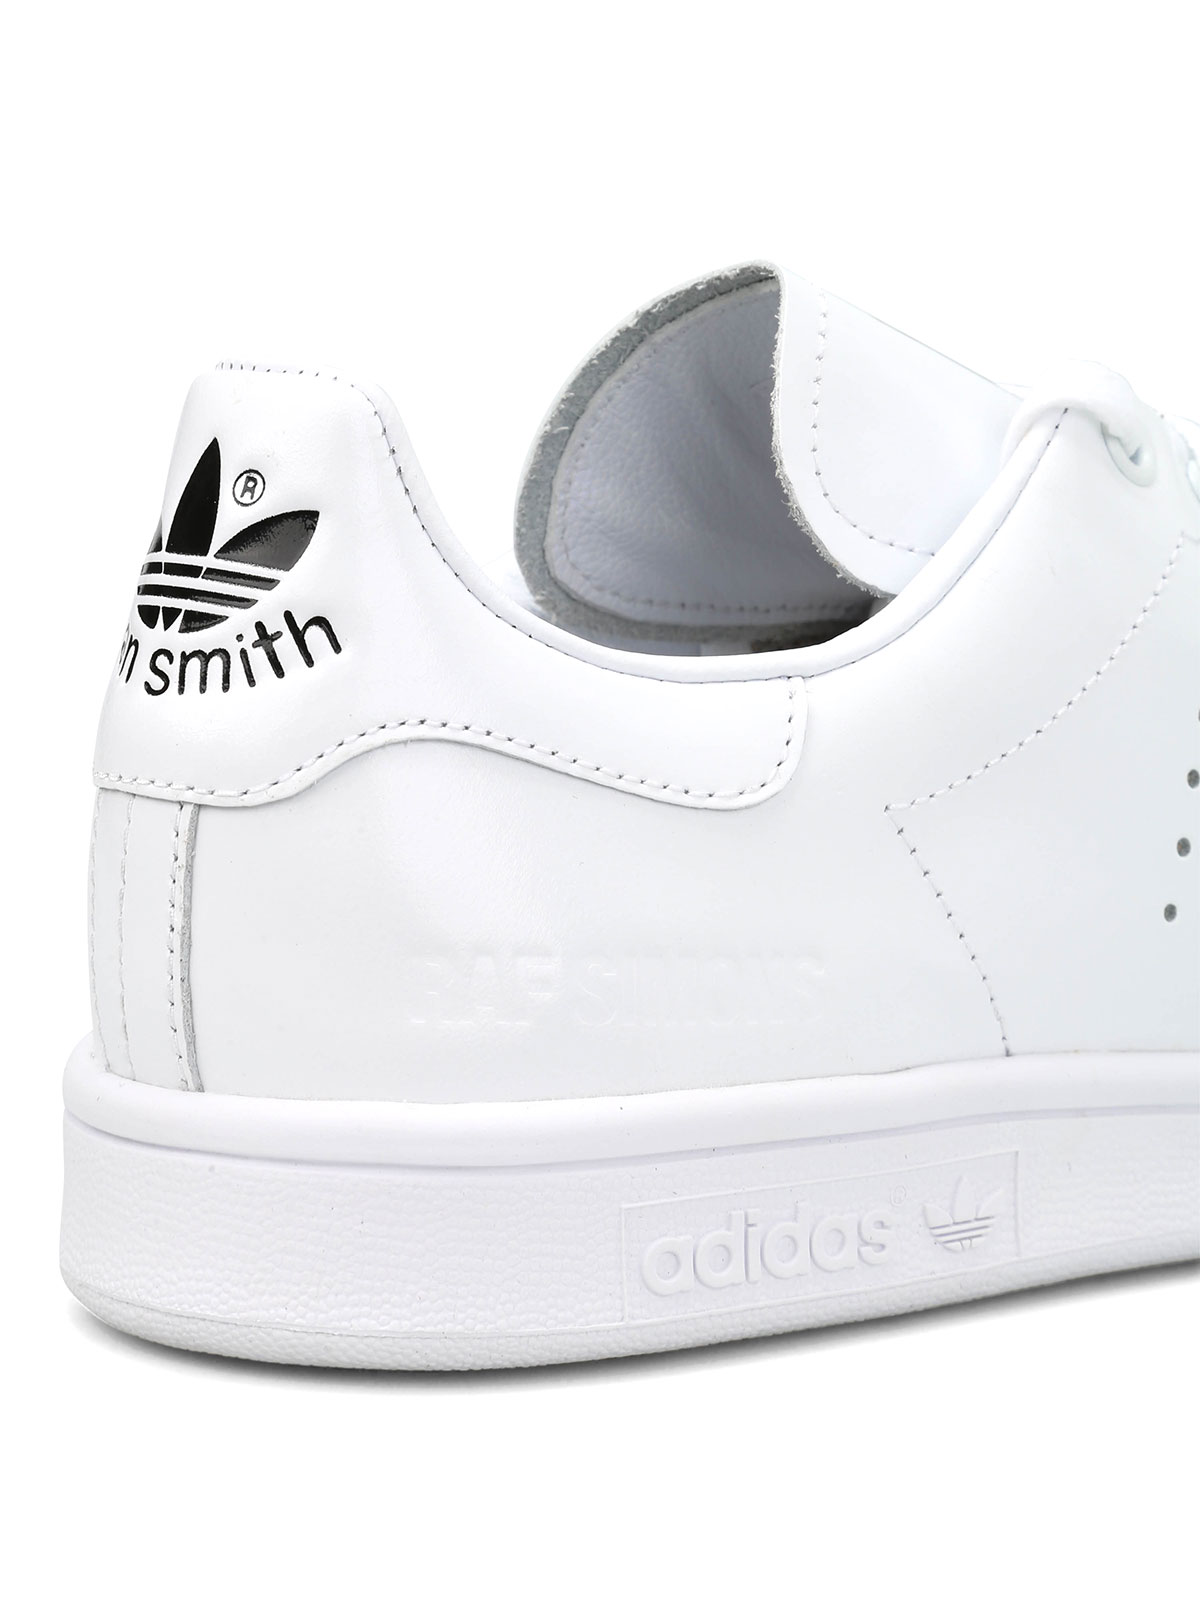 adidas stan smith shop online